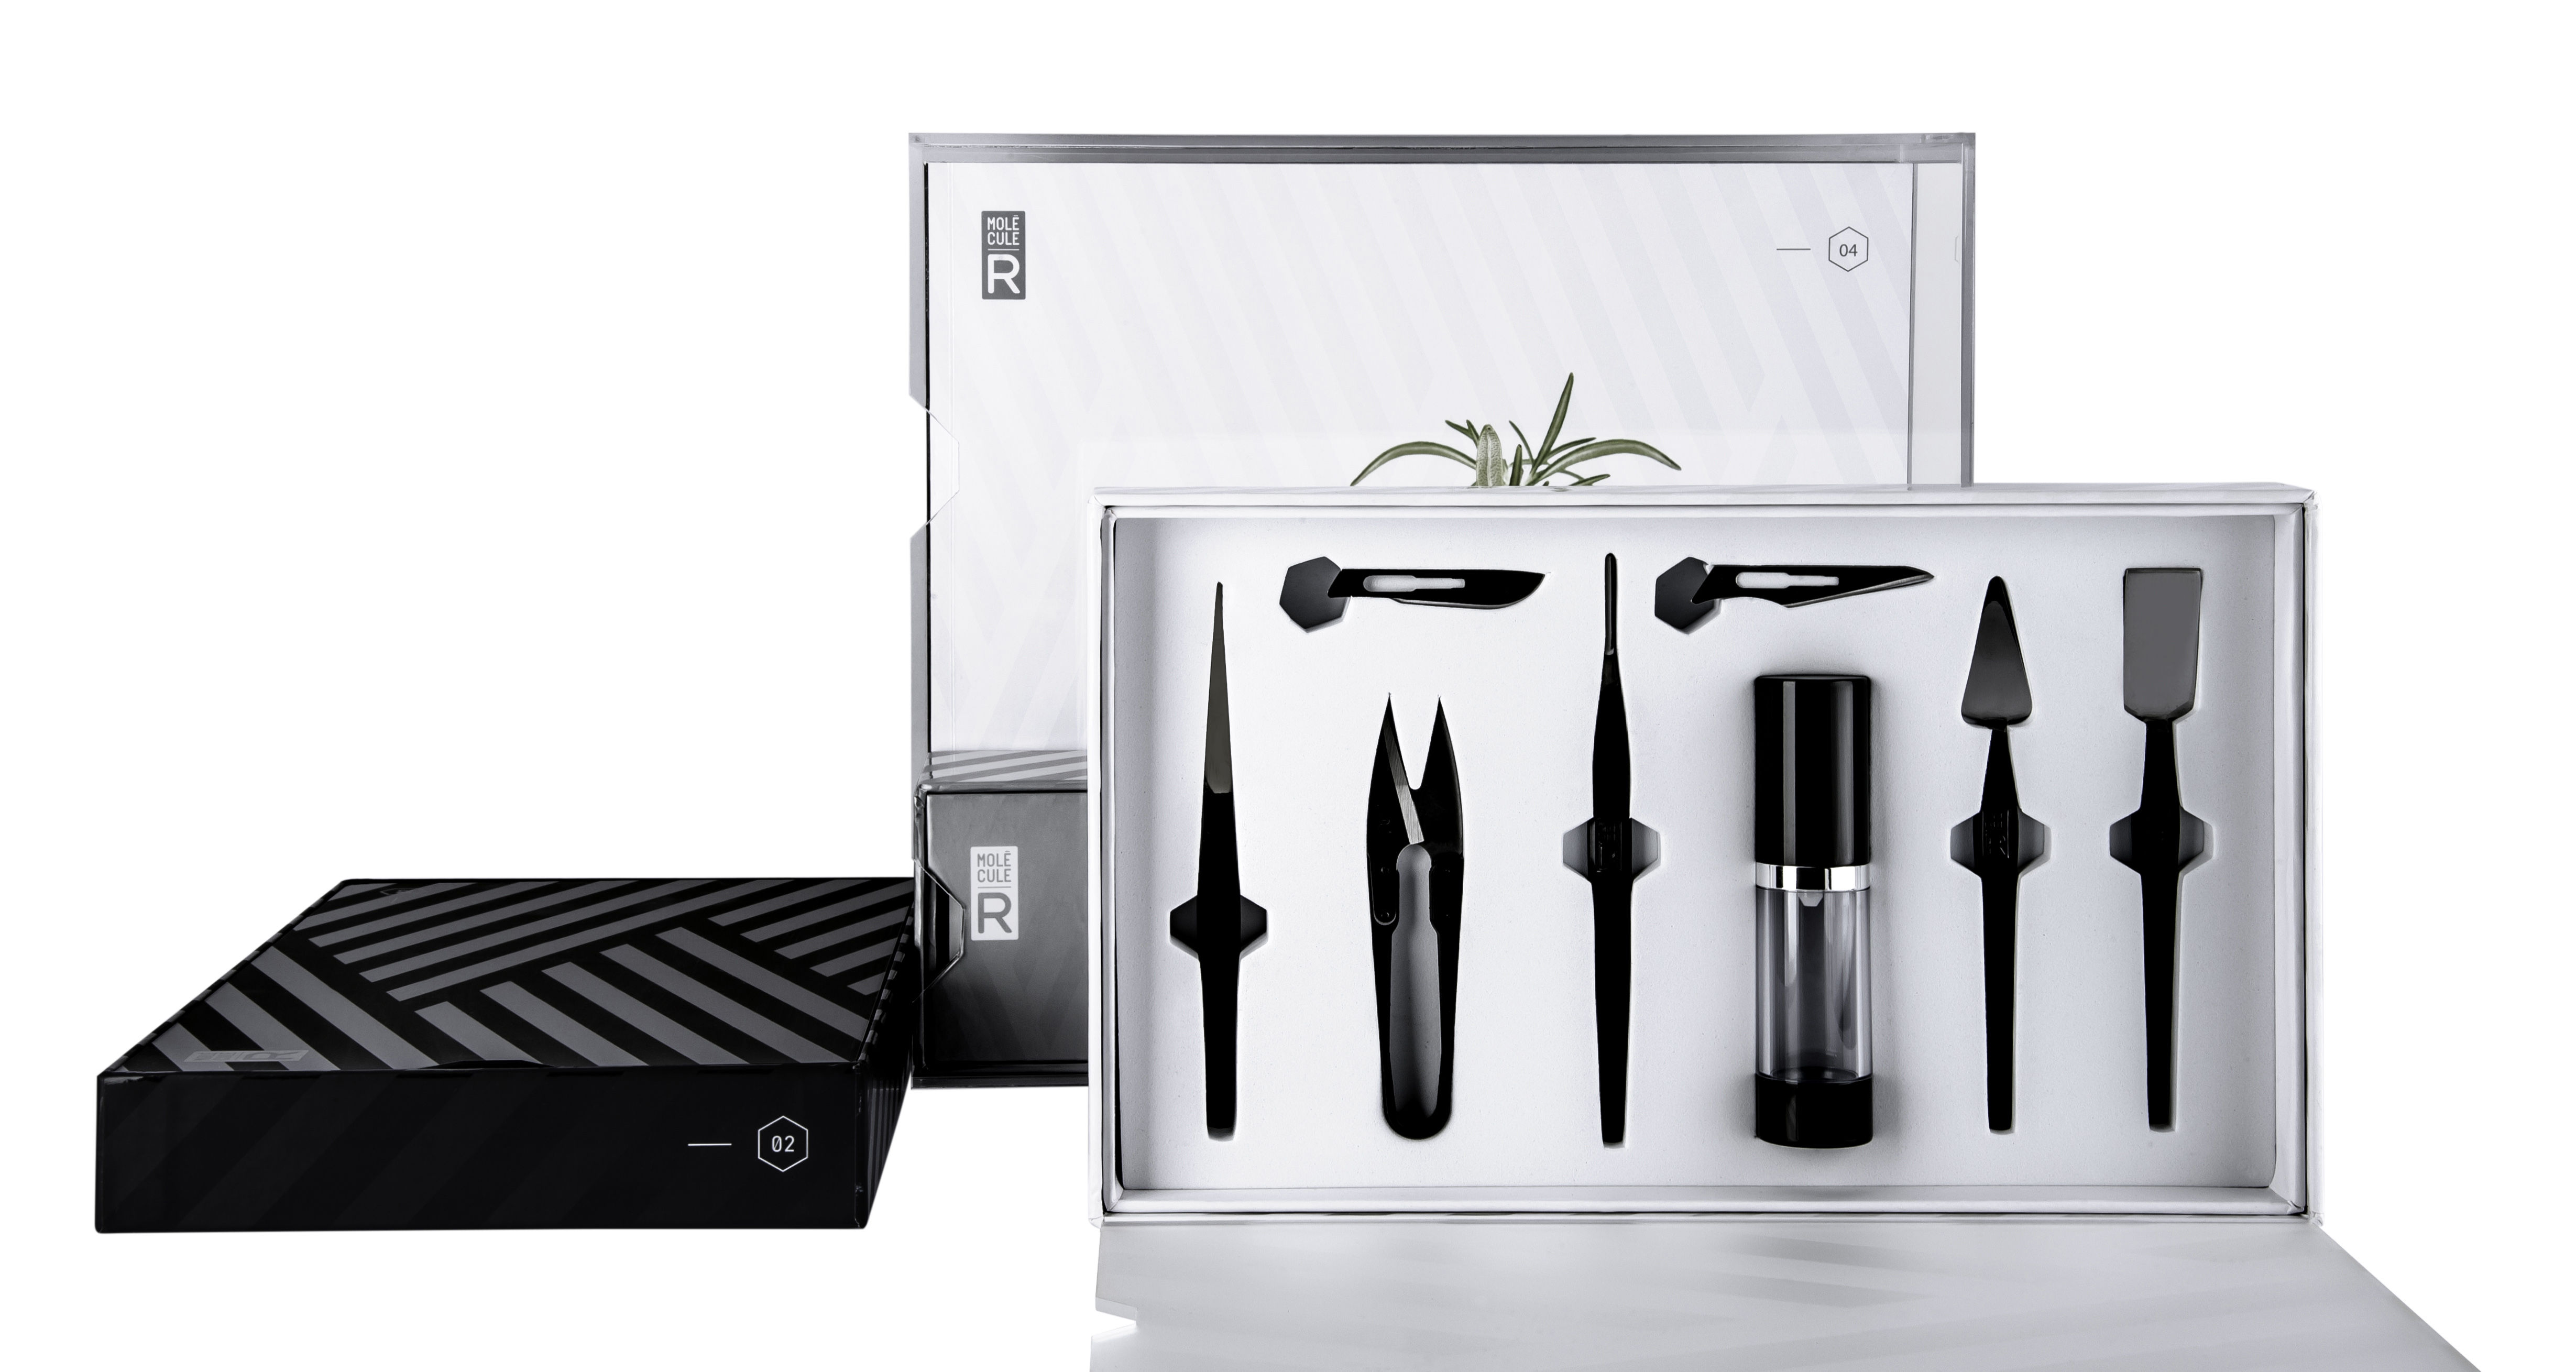 kit cuisine mol culaire molecular styling kit 19 ustensiles 2 dvd 1 livre 4 additifs. Black Bedroom Furniture Sets. Home Design Ideas